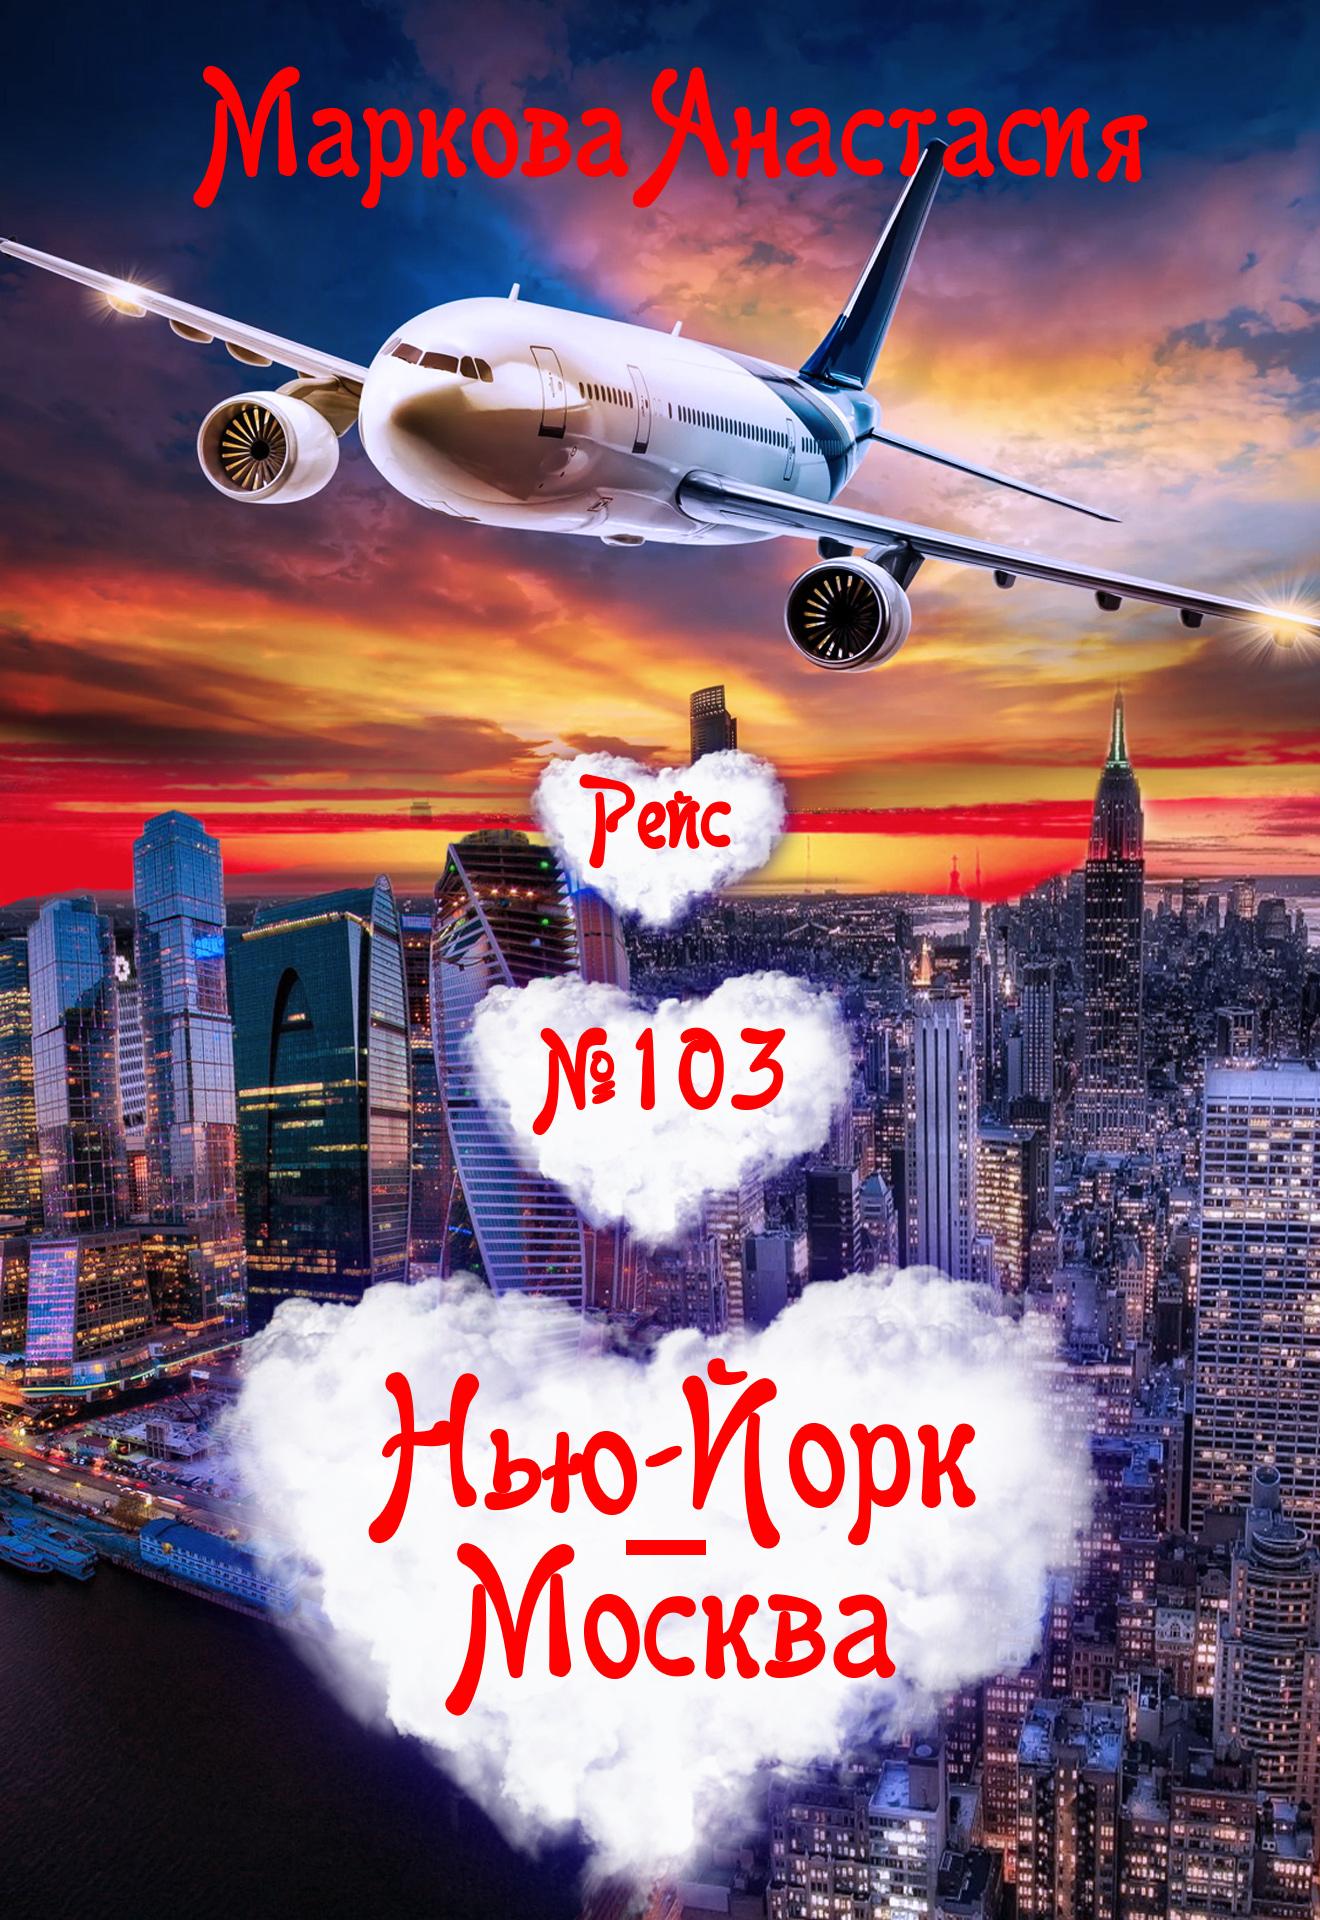 Анастасия Маркова Рейс № 103 Нью-Йорк – Москва рейс амстердам москва